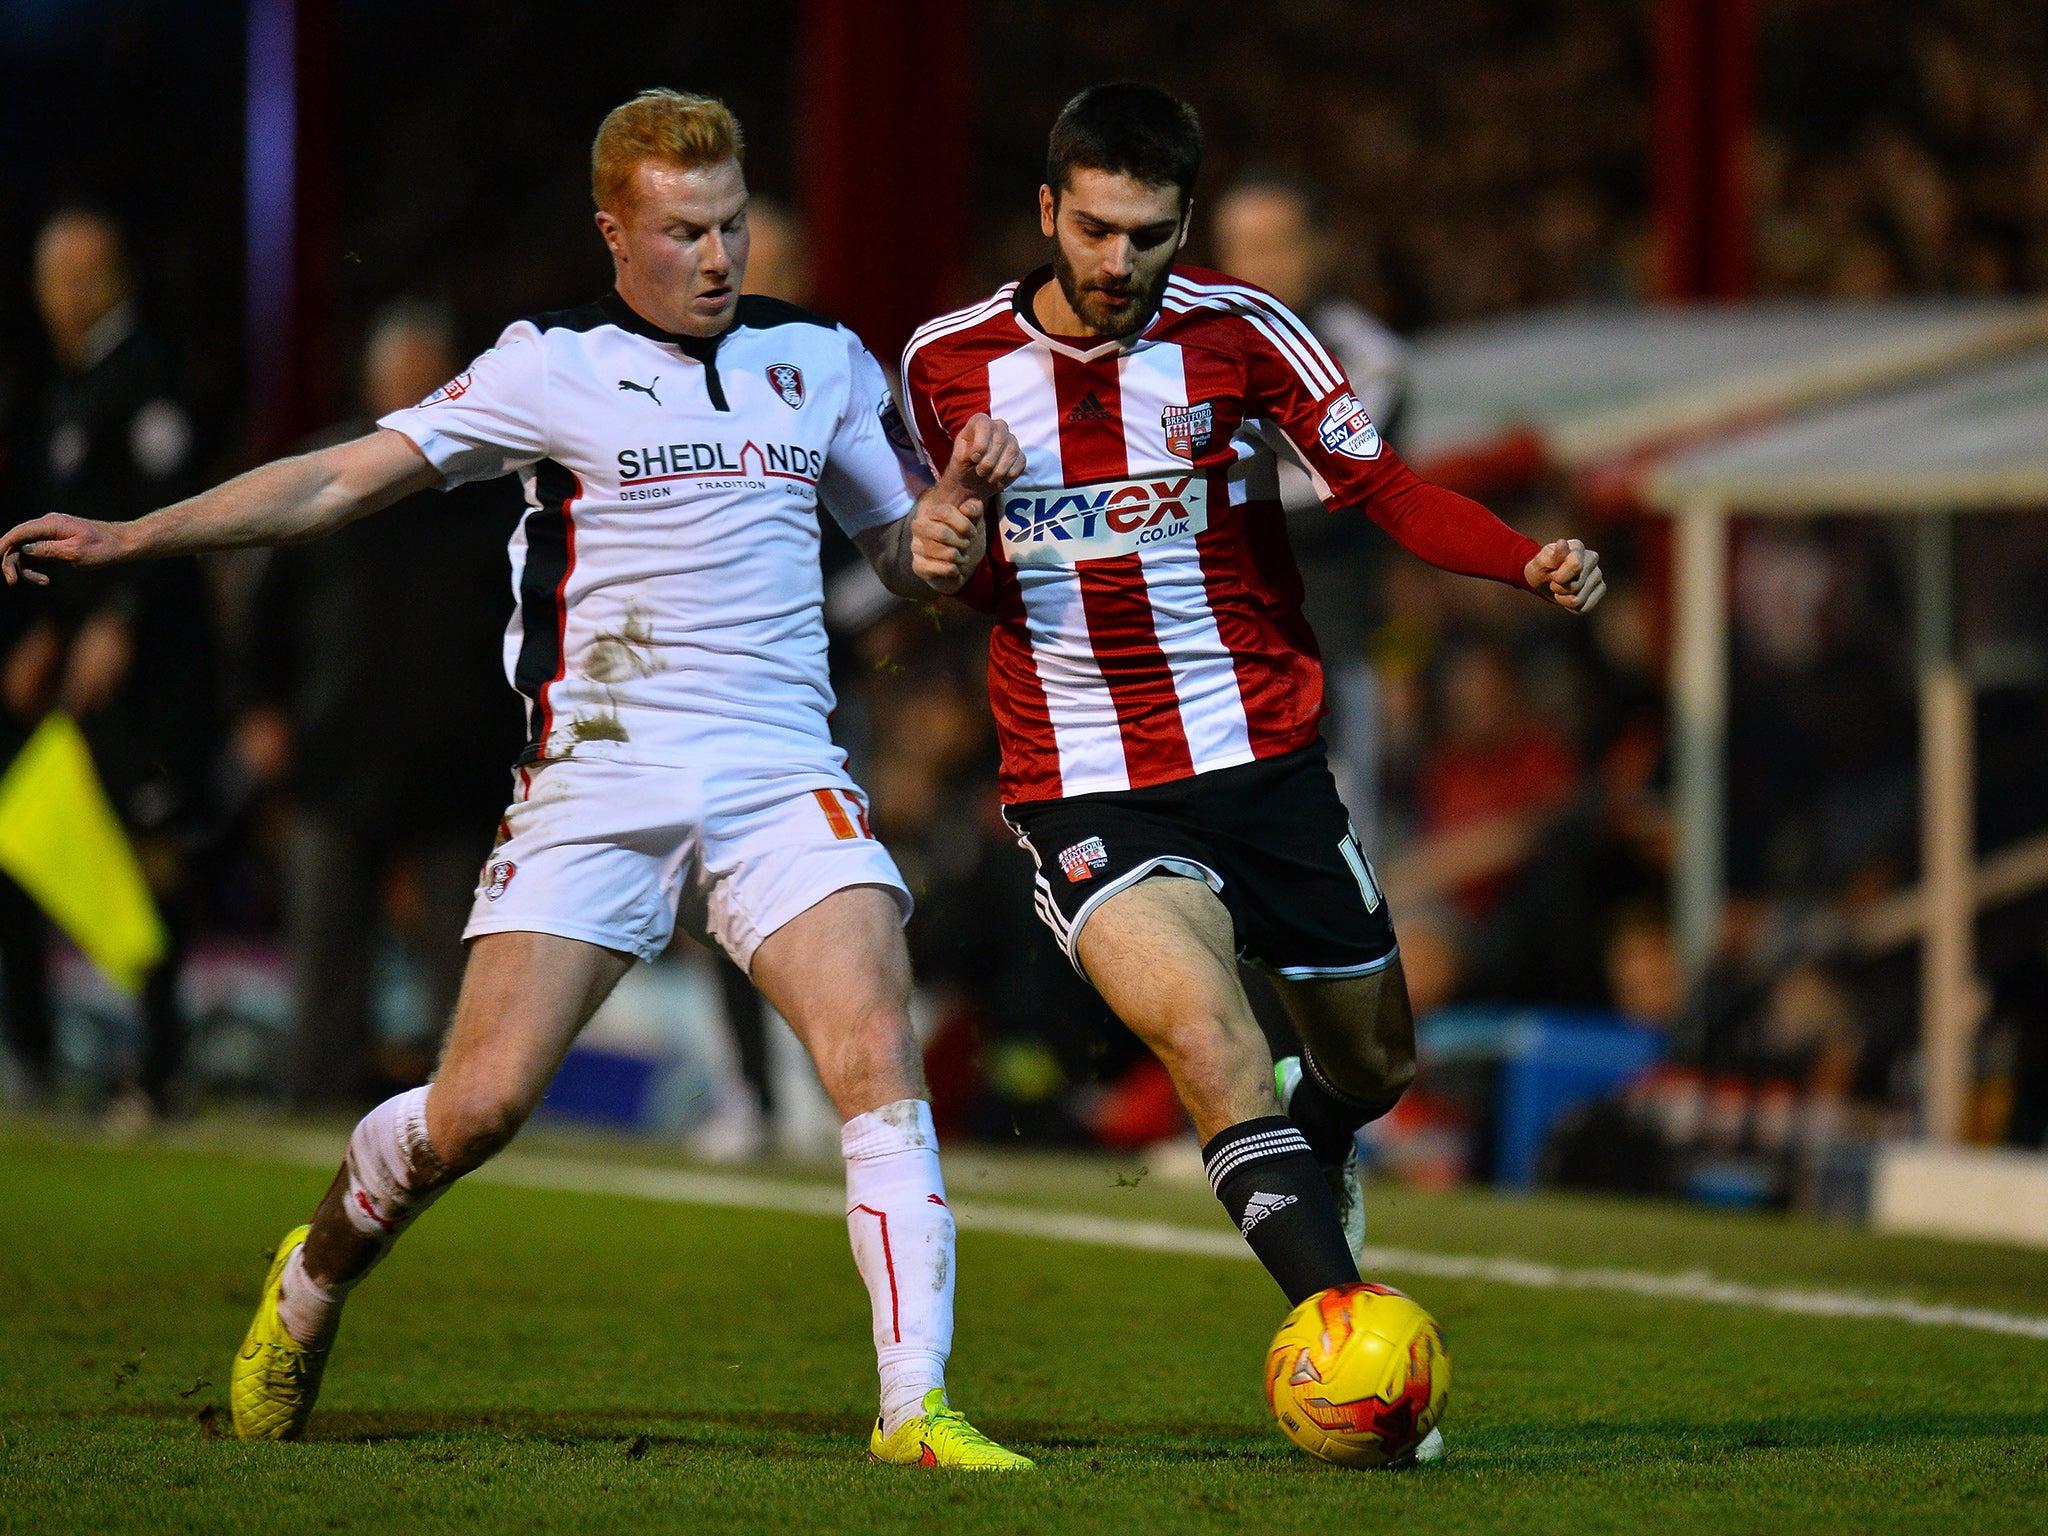 Ahead of the Game: Brentford FCs 2014/15 Season